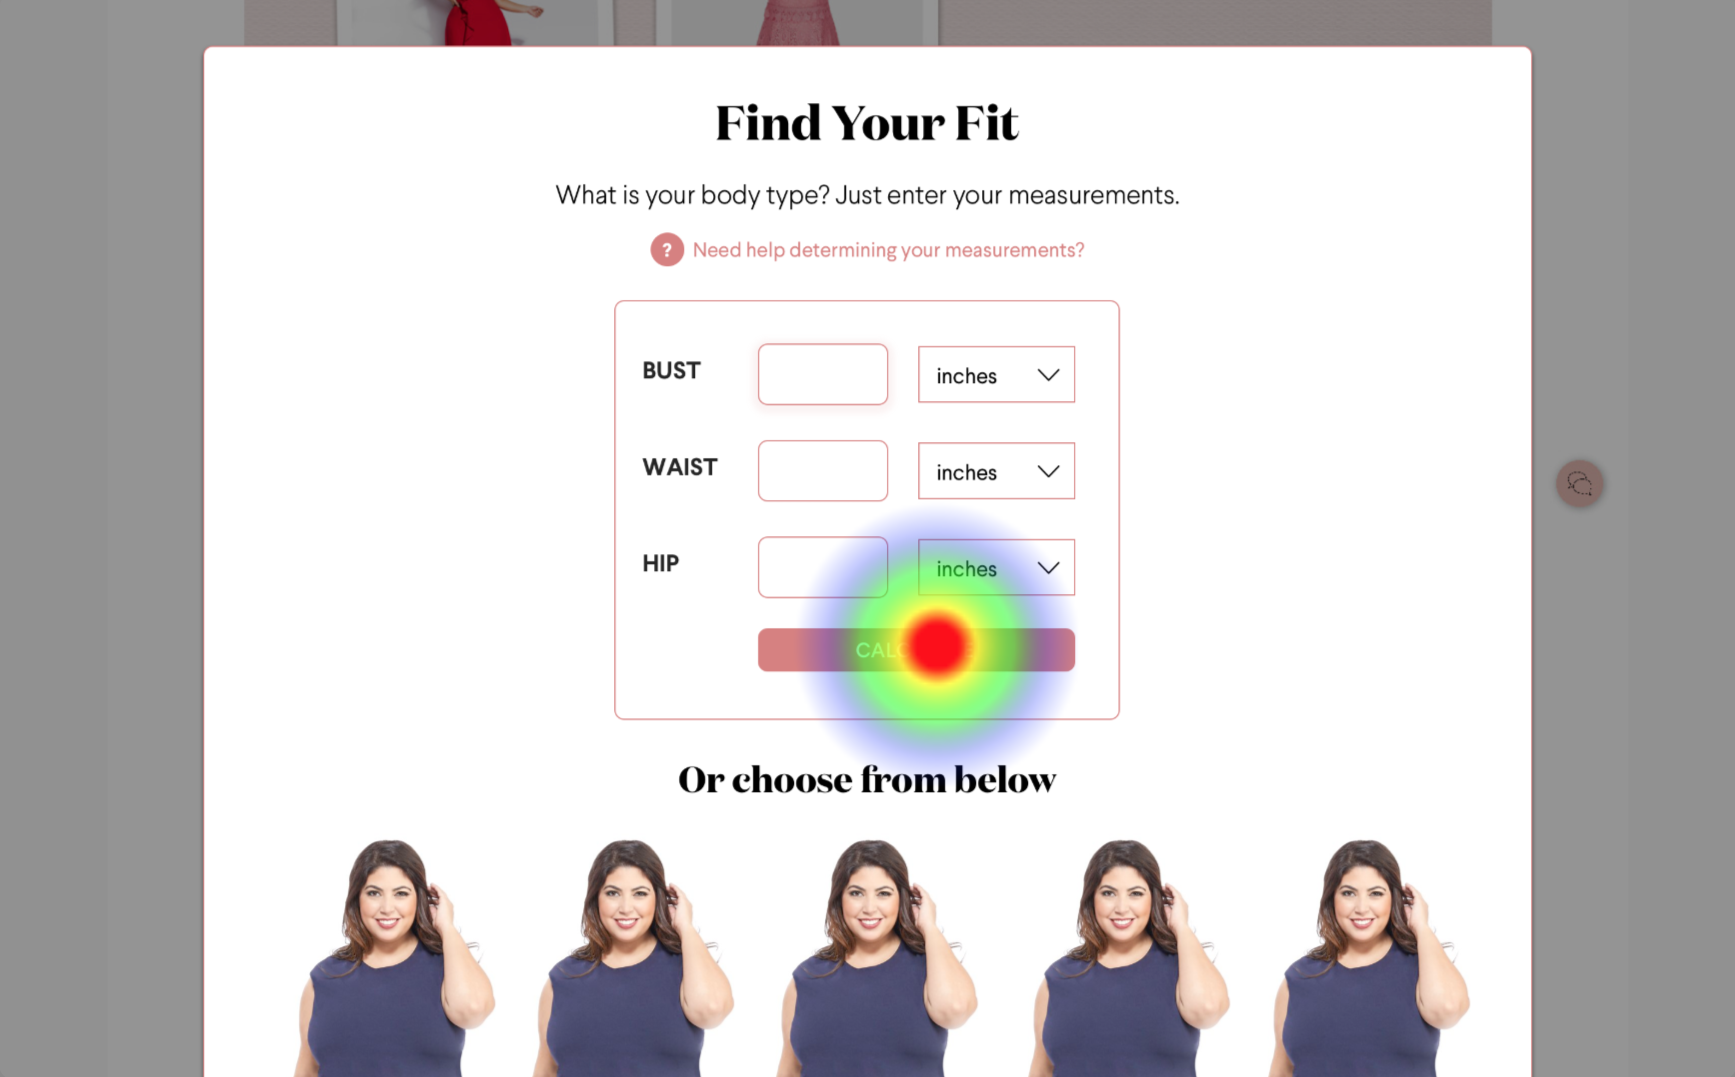 Task 1 - Use Body Type Calculator